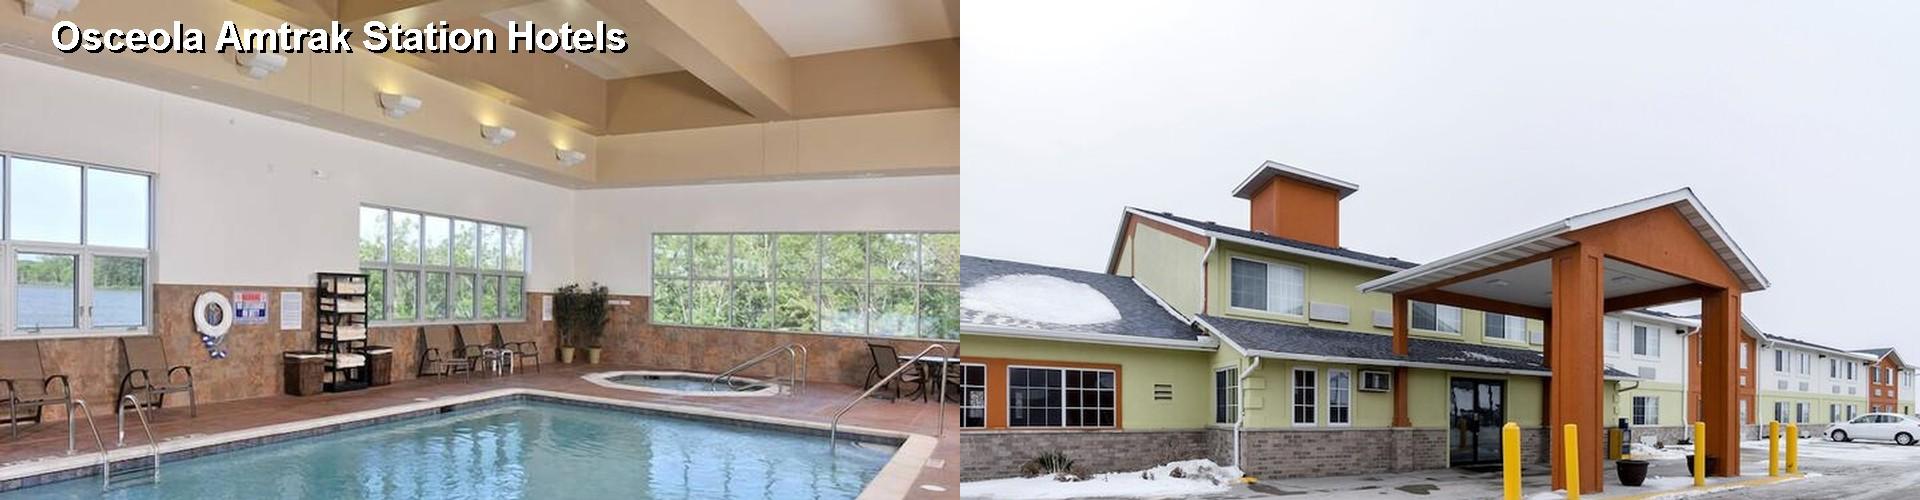 4 Best Hotels Near Osceola Amtrak Station